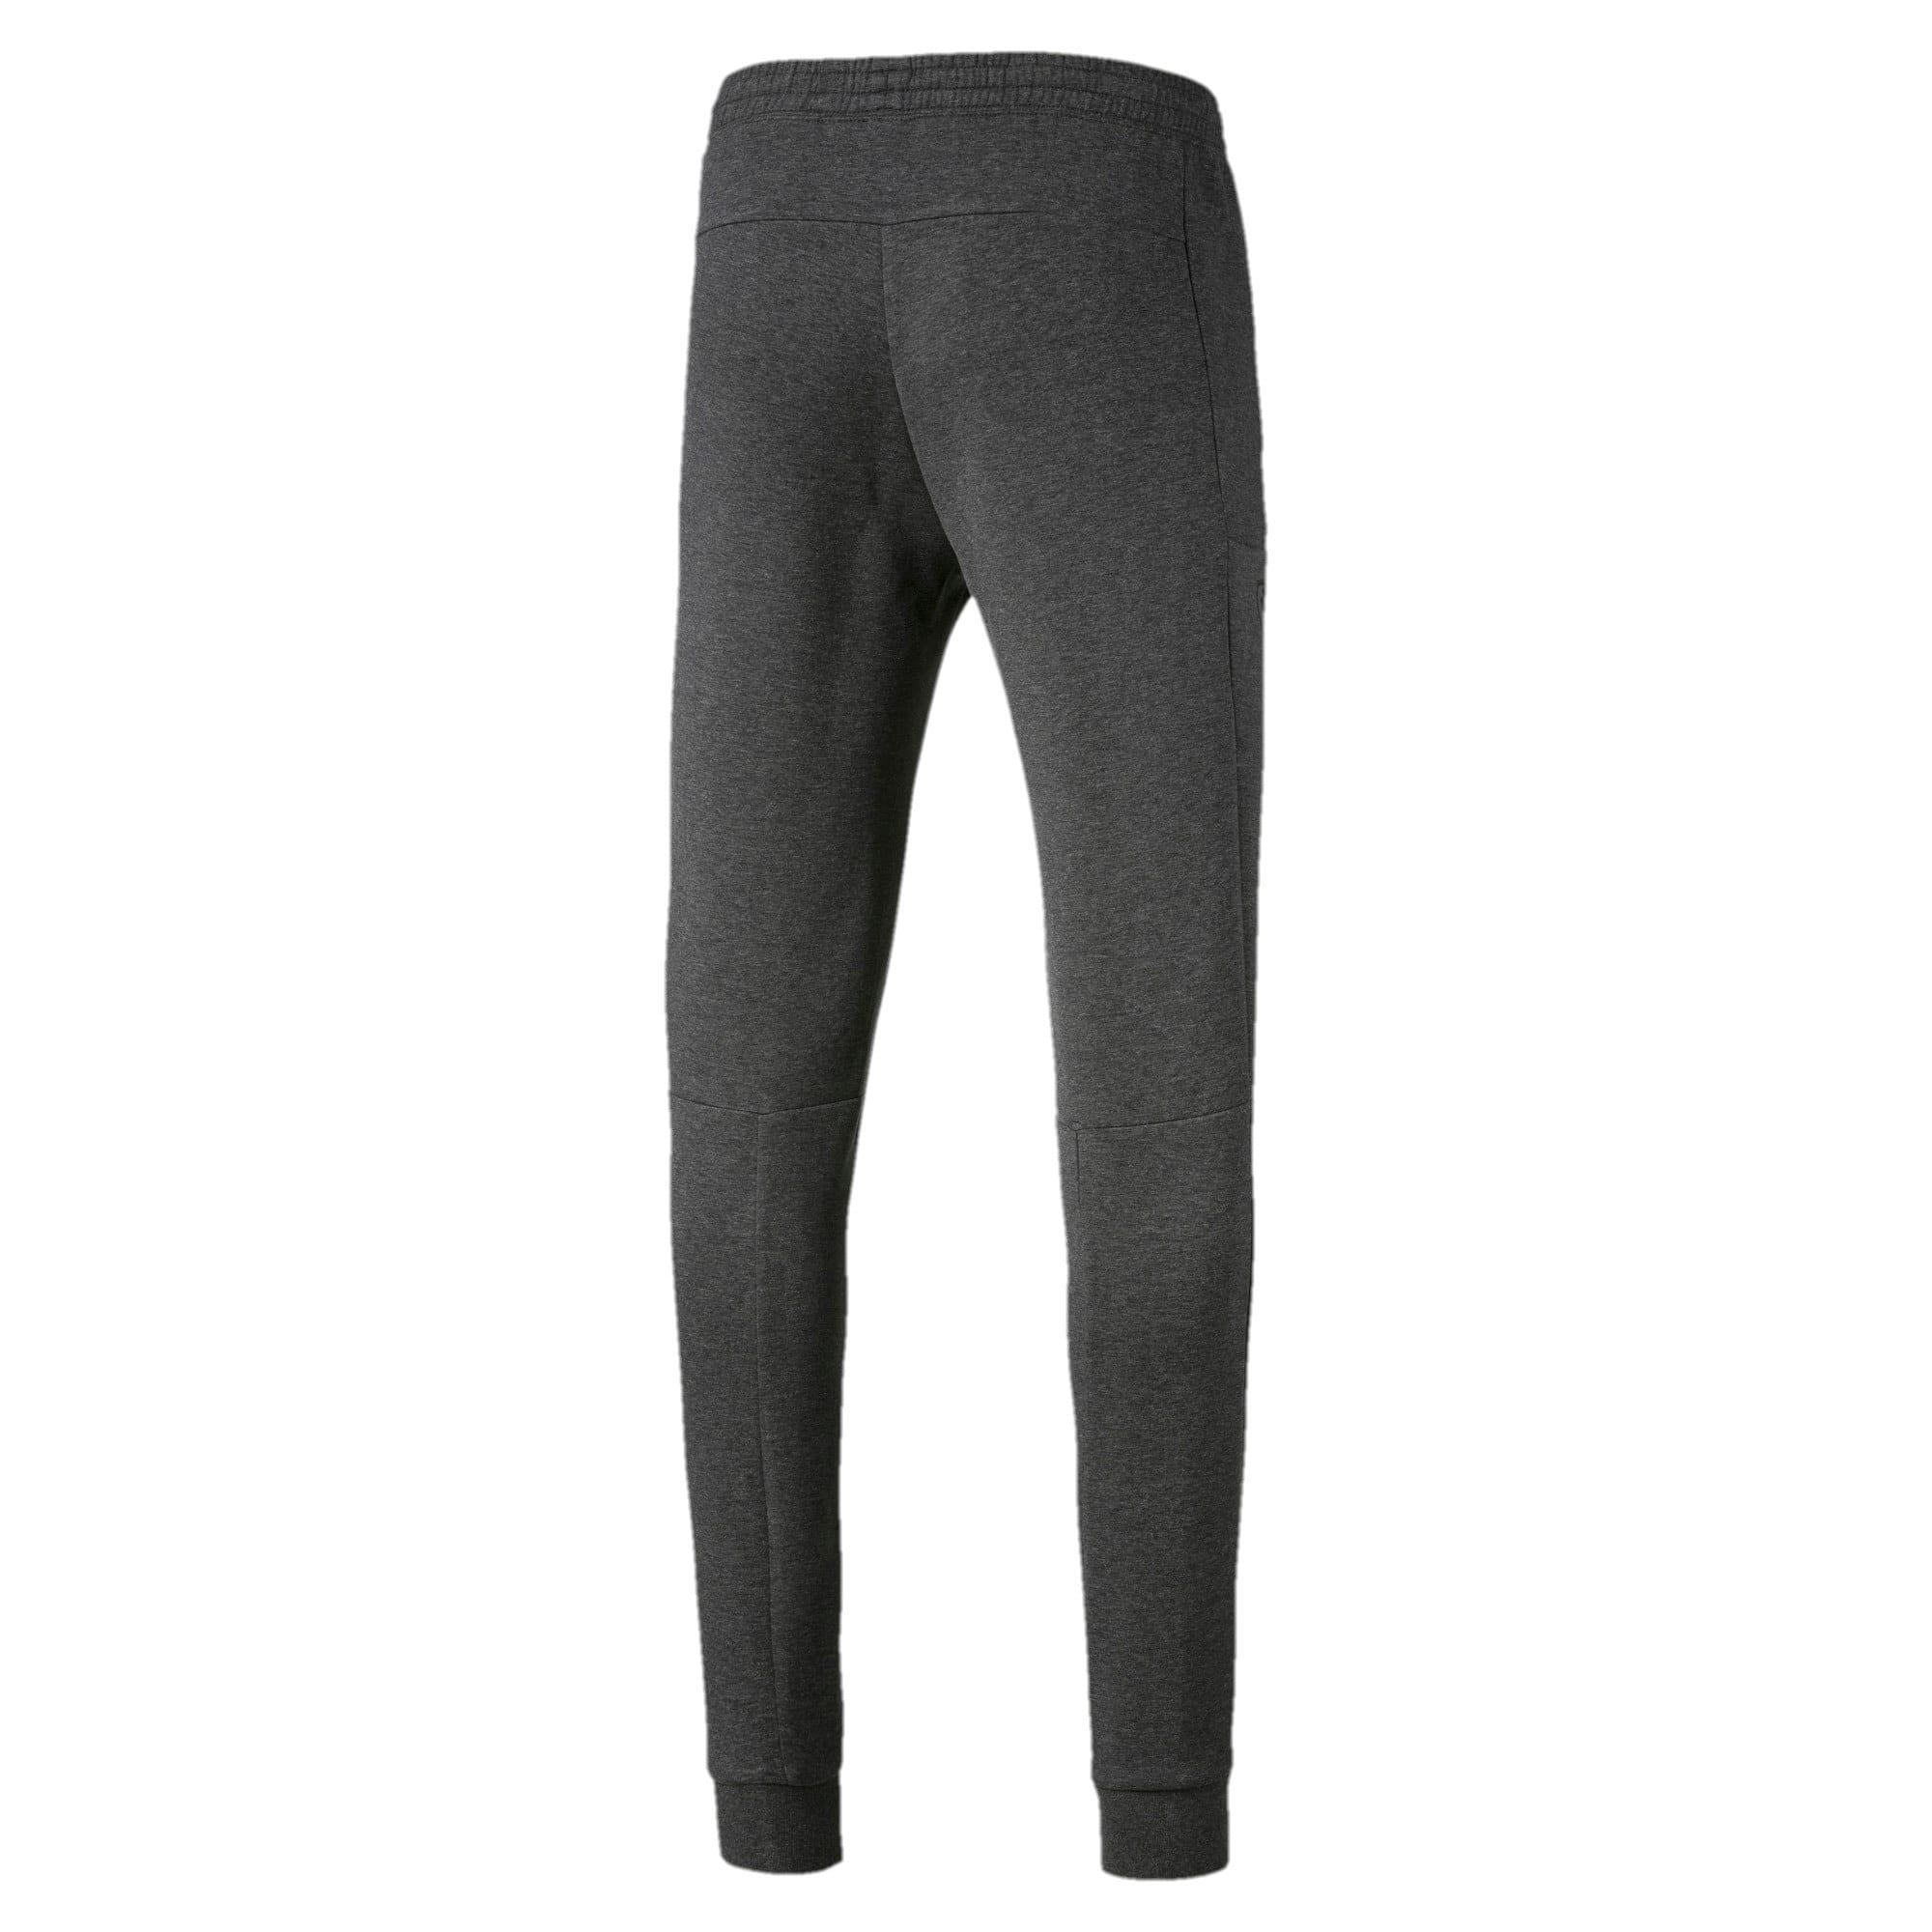 Miniatura 2 de Pantalones deportivos Ferrari para hombre, Dark Gray Heather, mediano